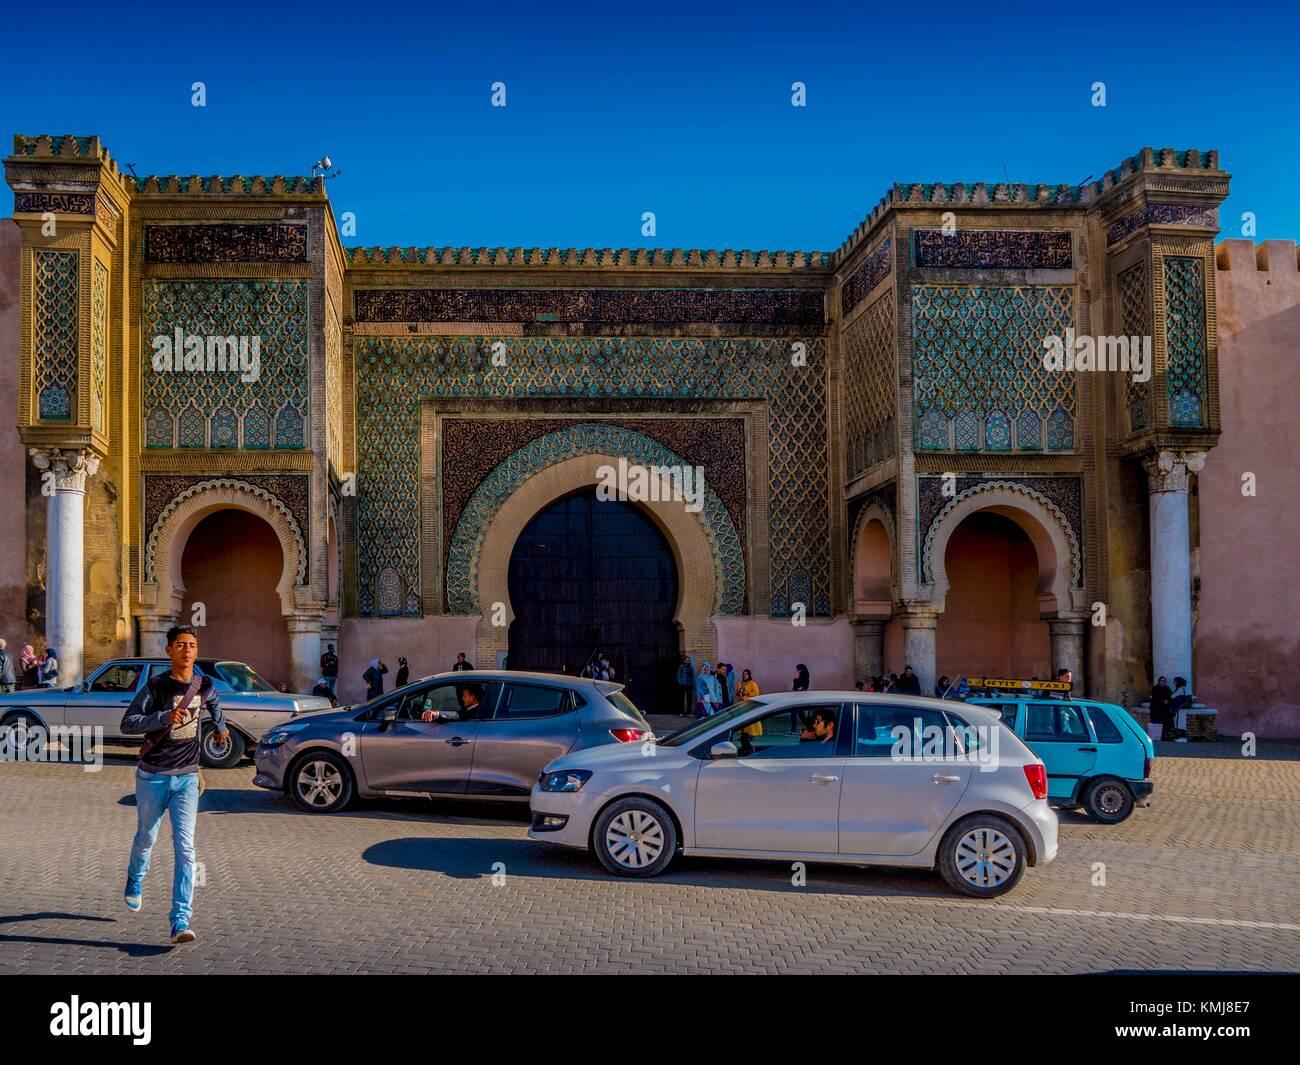 "Marokko, Meknes, der berühmten ""Bab Mansour' Tor, in Meknes. Stockbild"